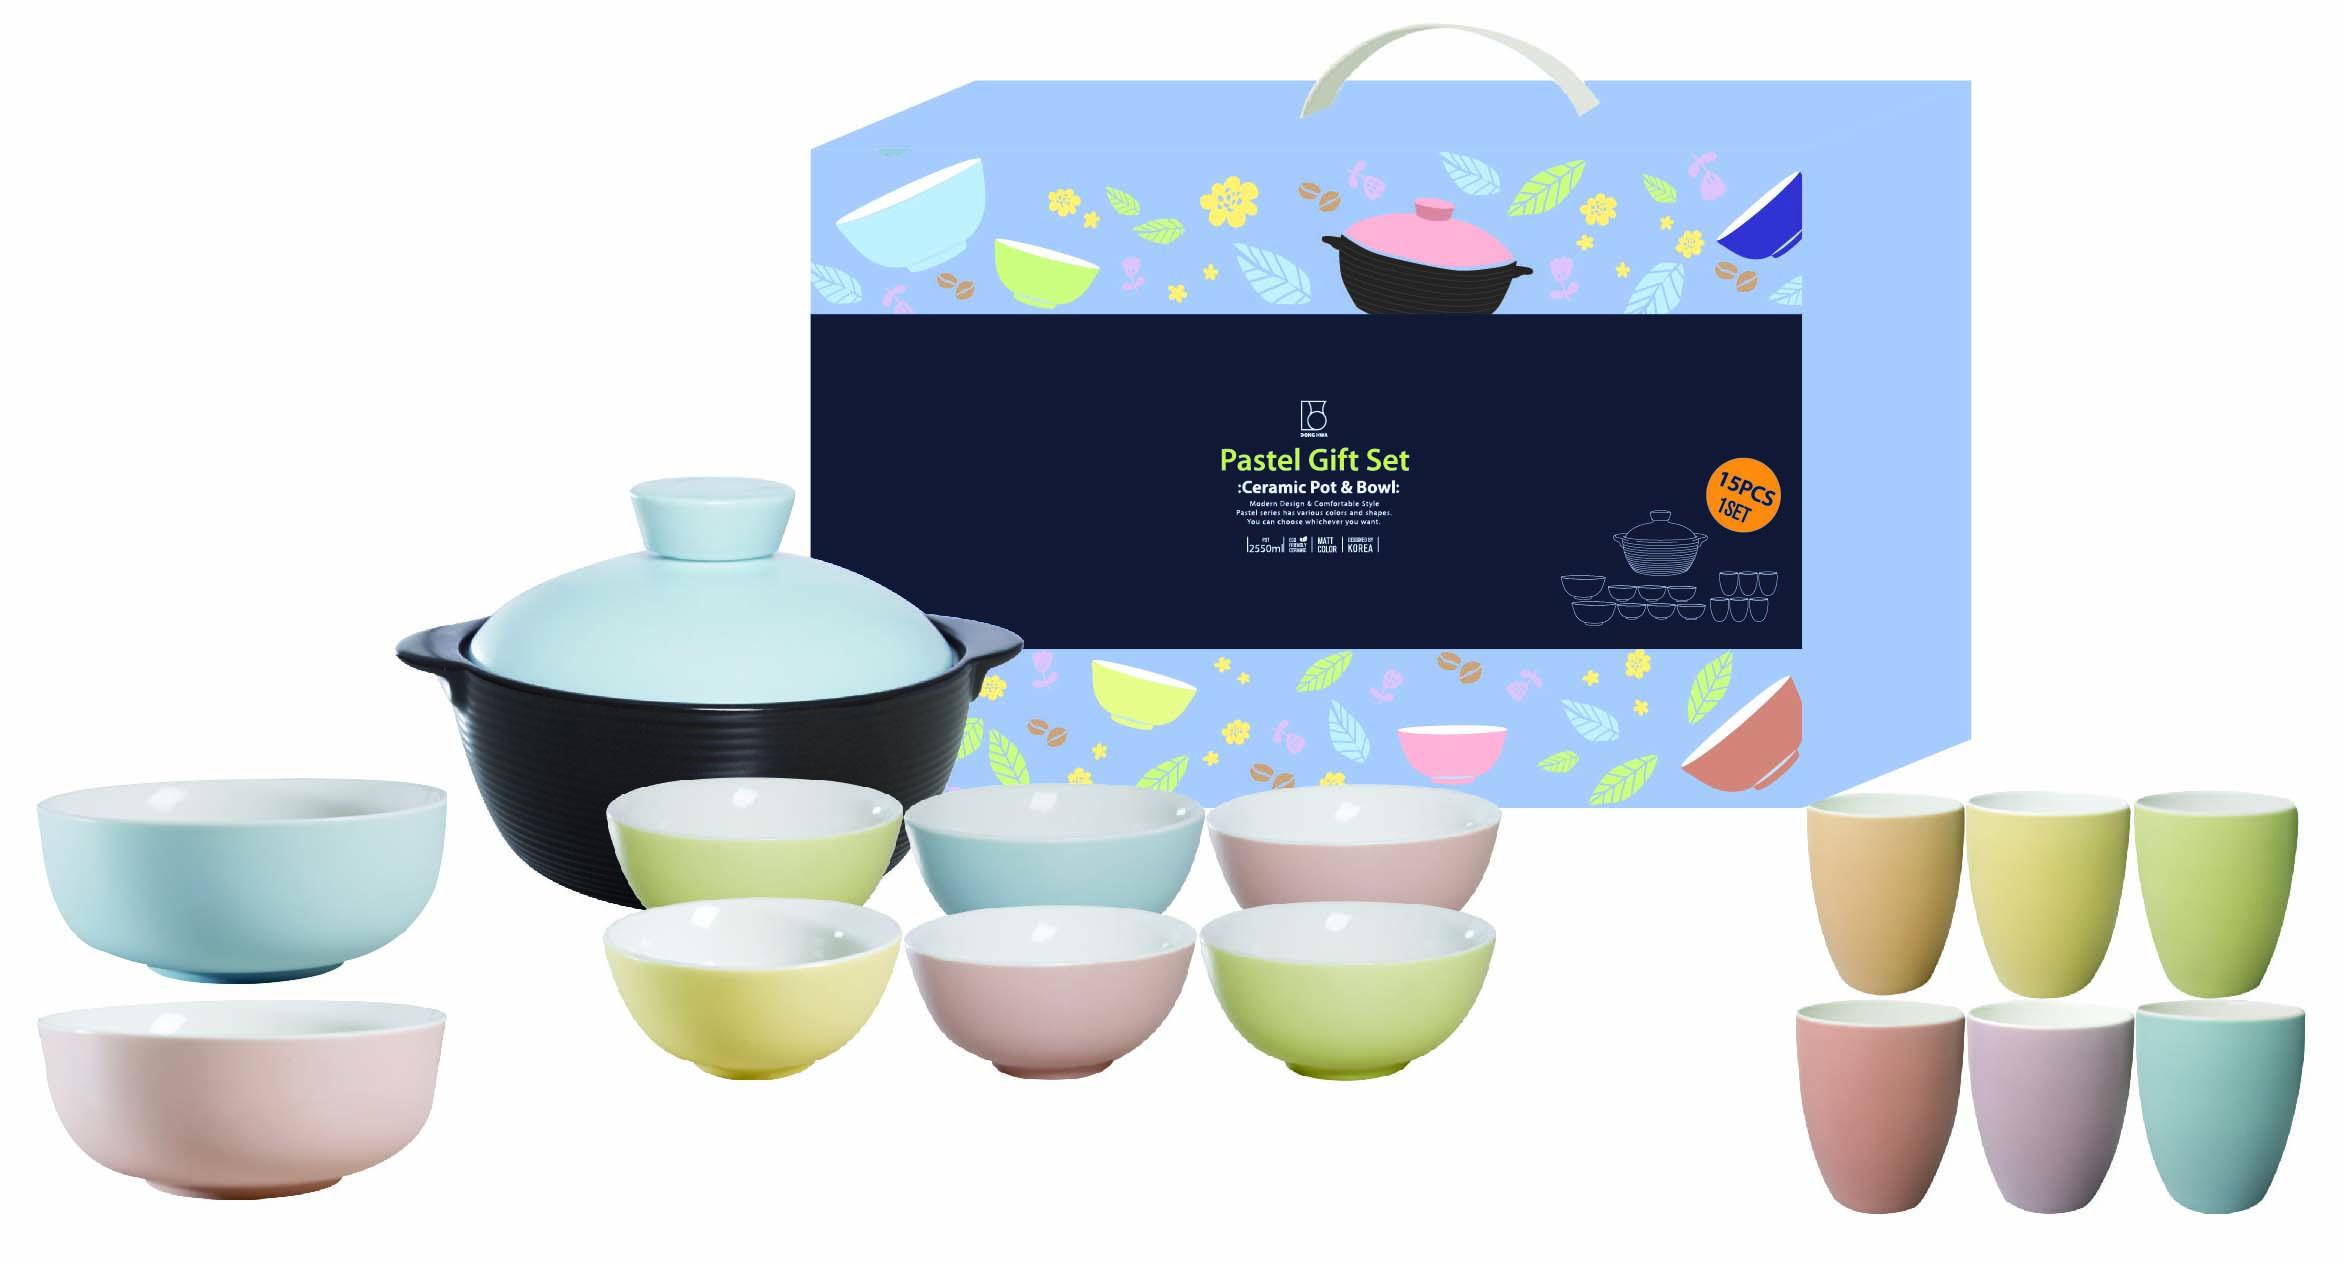 http://tikicdn.com/media/catalog/product/p/a/pastel_set_1_pot_6_rice_bowl_6_cup_6_saucer_bowl_real_product.jpg